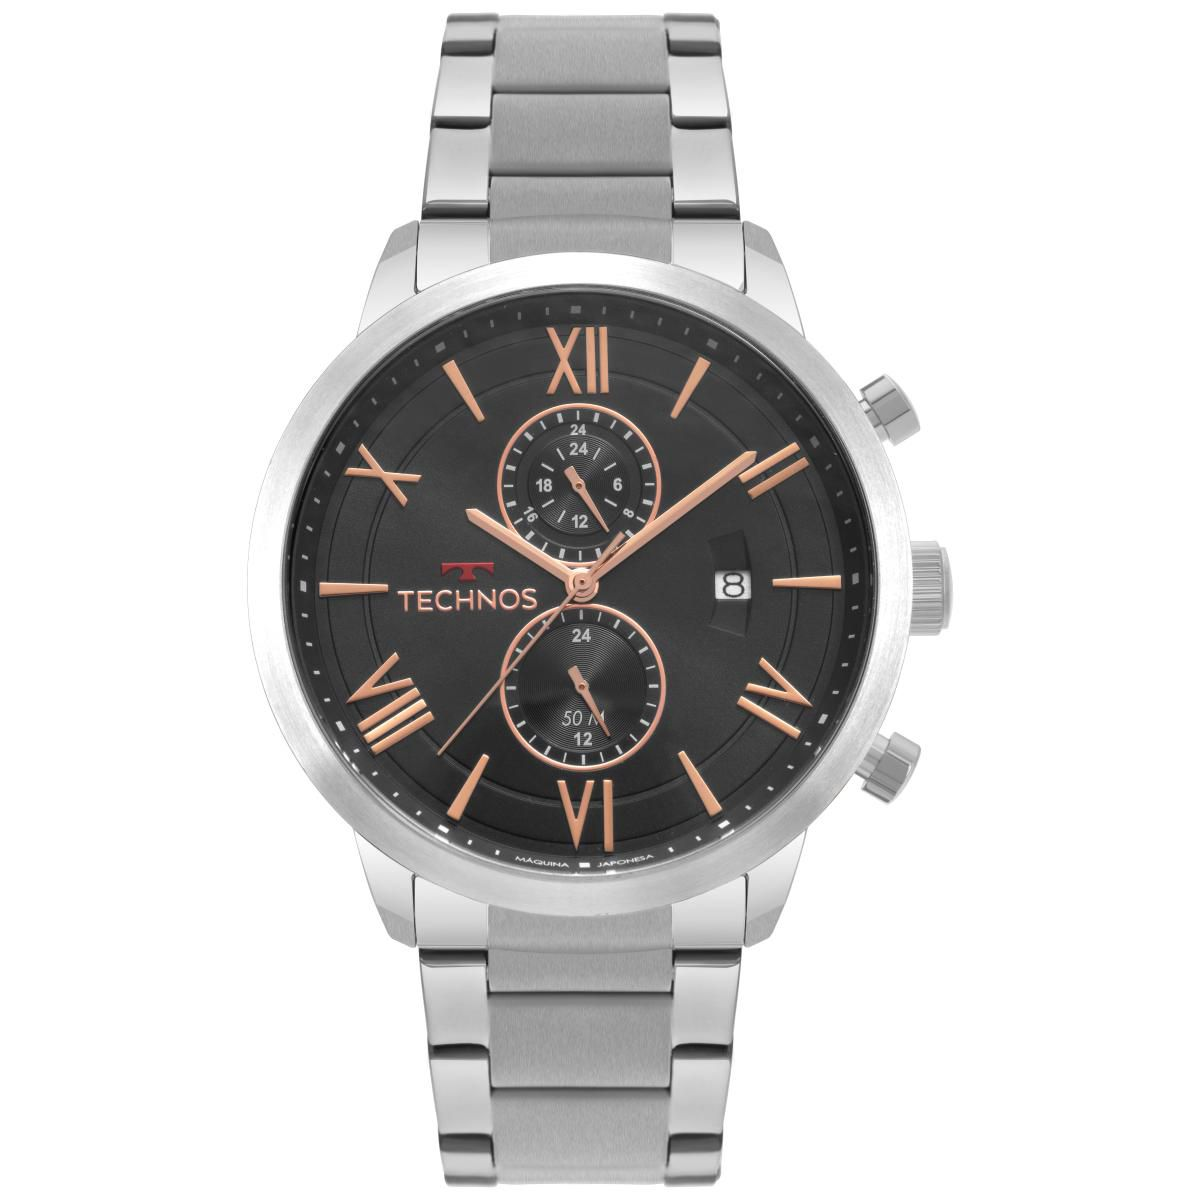 Relógio Masculino Technos GrandTech JP11AB/1P 48mm Aço Prata